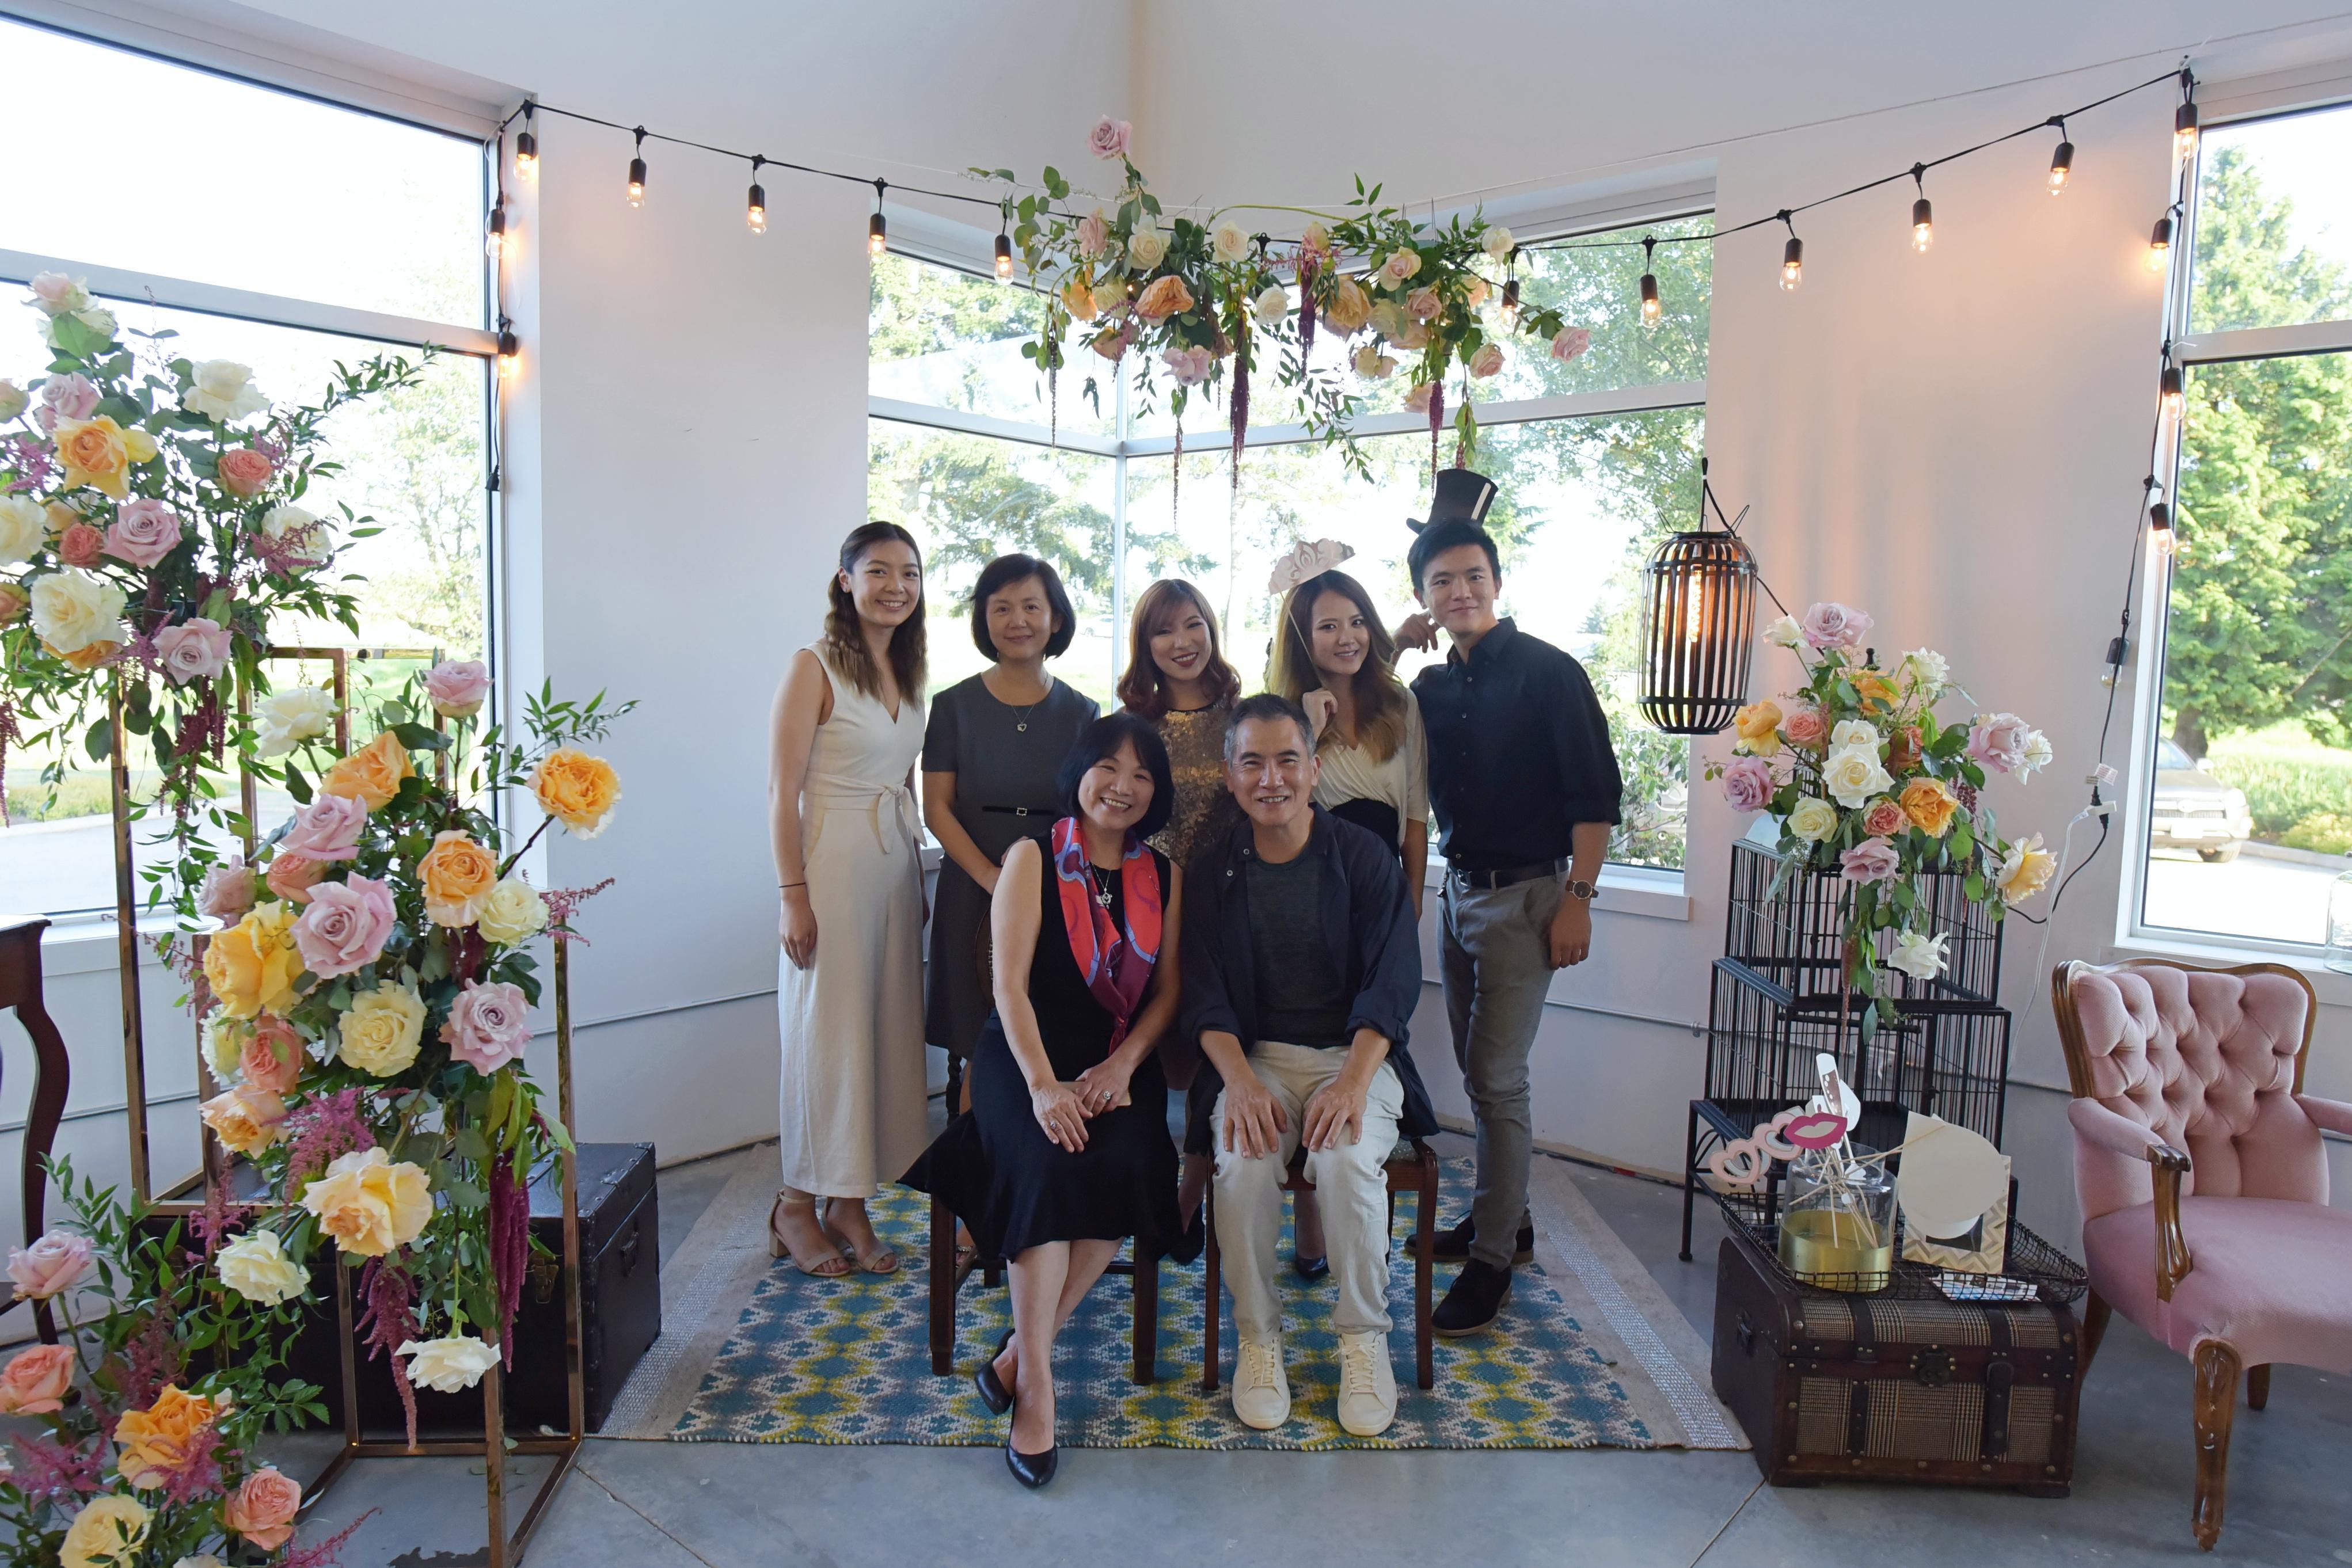 Miix Showroom Grant Opening